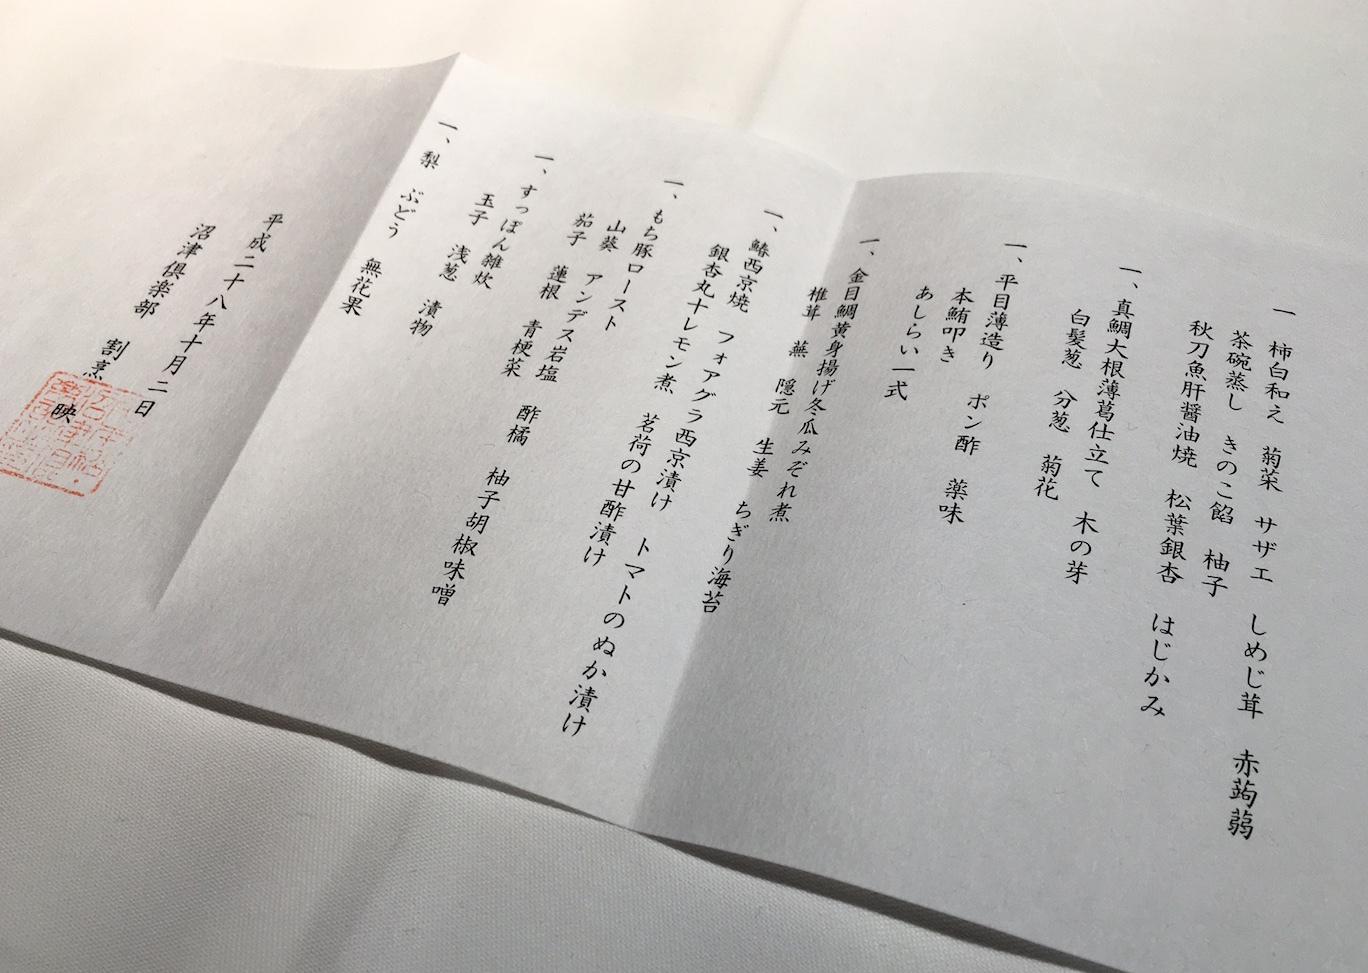 日本の旅、その4、沼津倶楽部/ Japan Trip 4, Numazu Club_e0310424_13440957.jpg